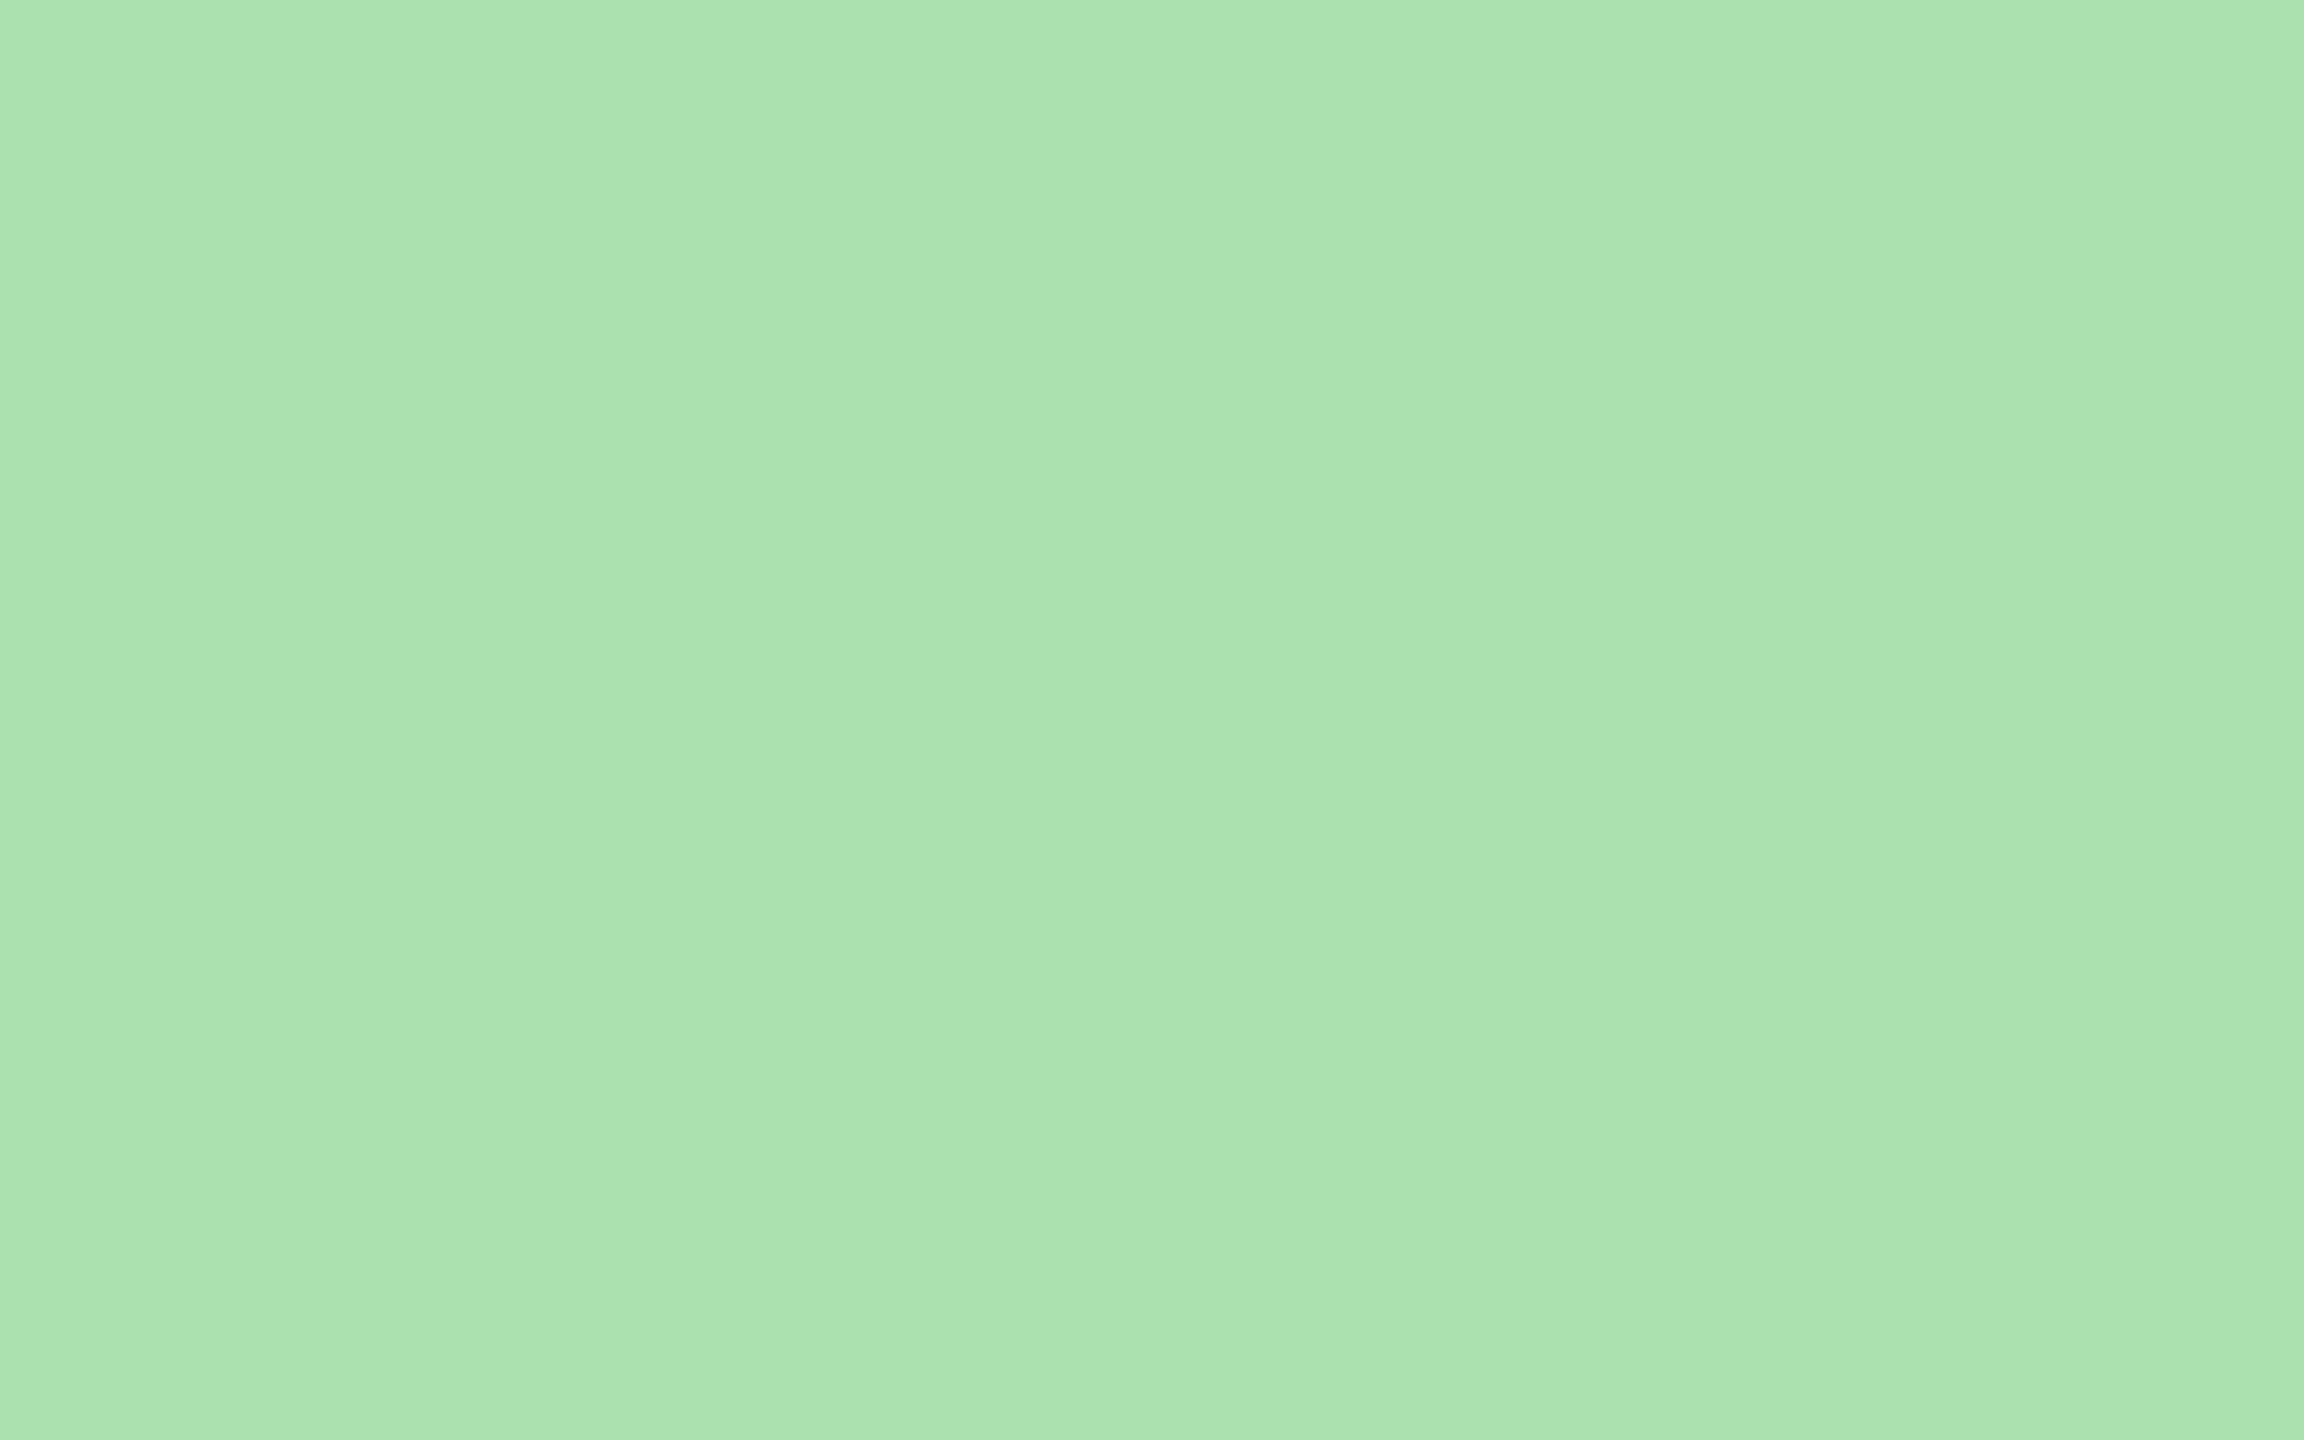 2304x1440 Celadon Solid Color Background